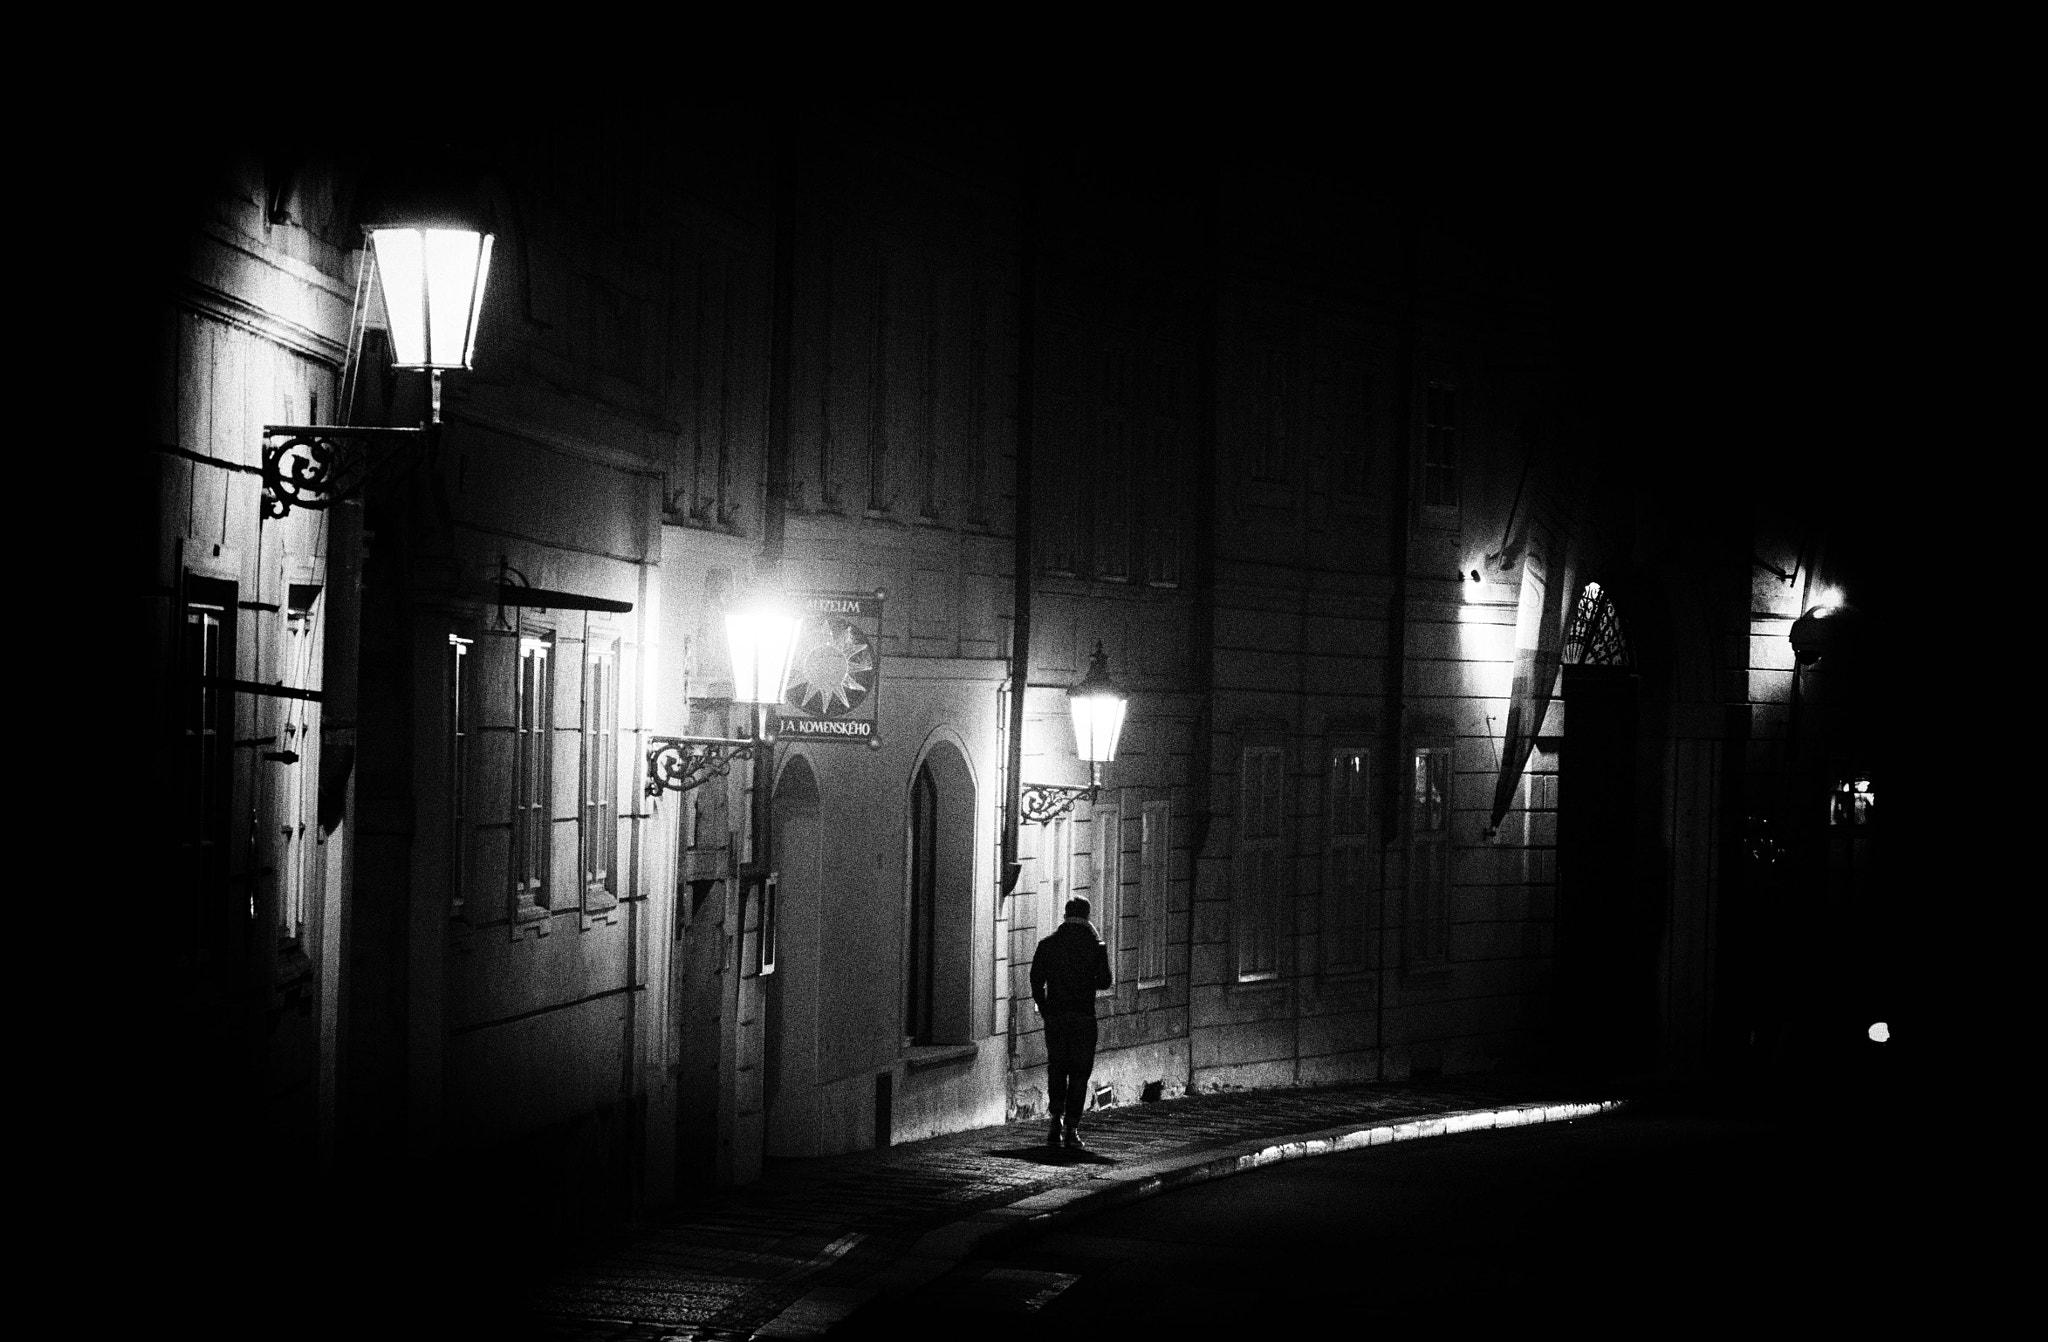 File:A Dark Street In Prague (157201501).jpeg - Wikimedia Commons